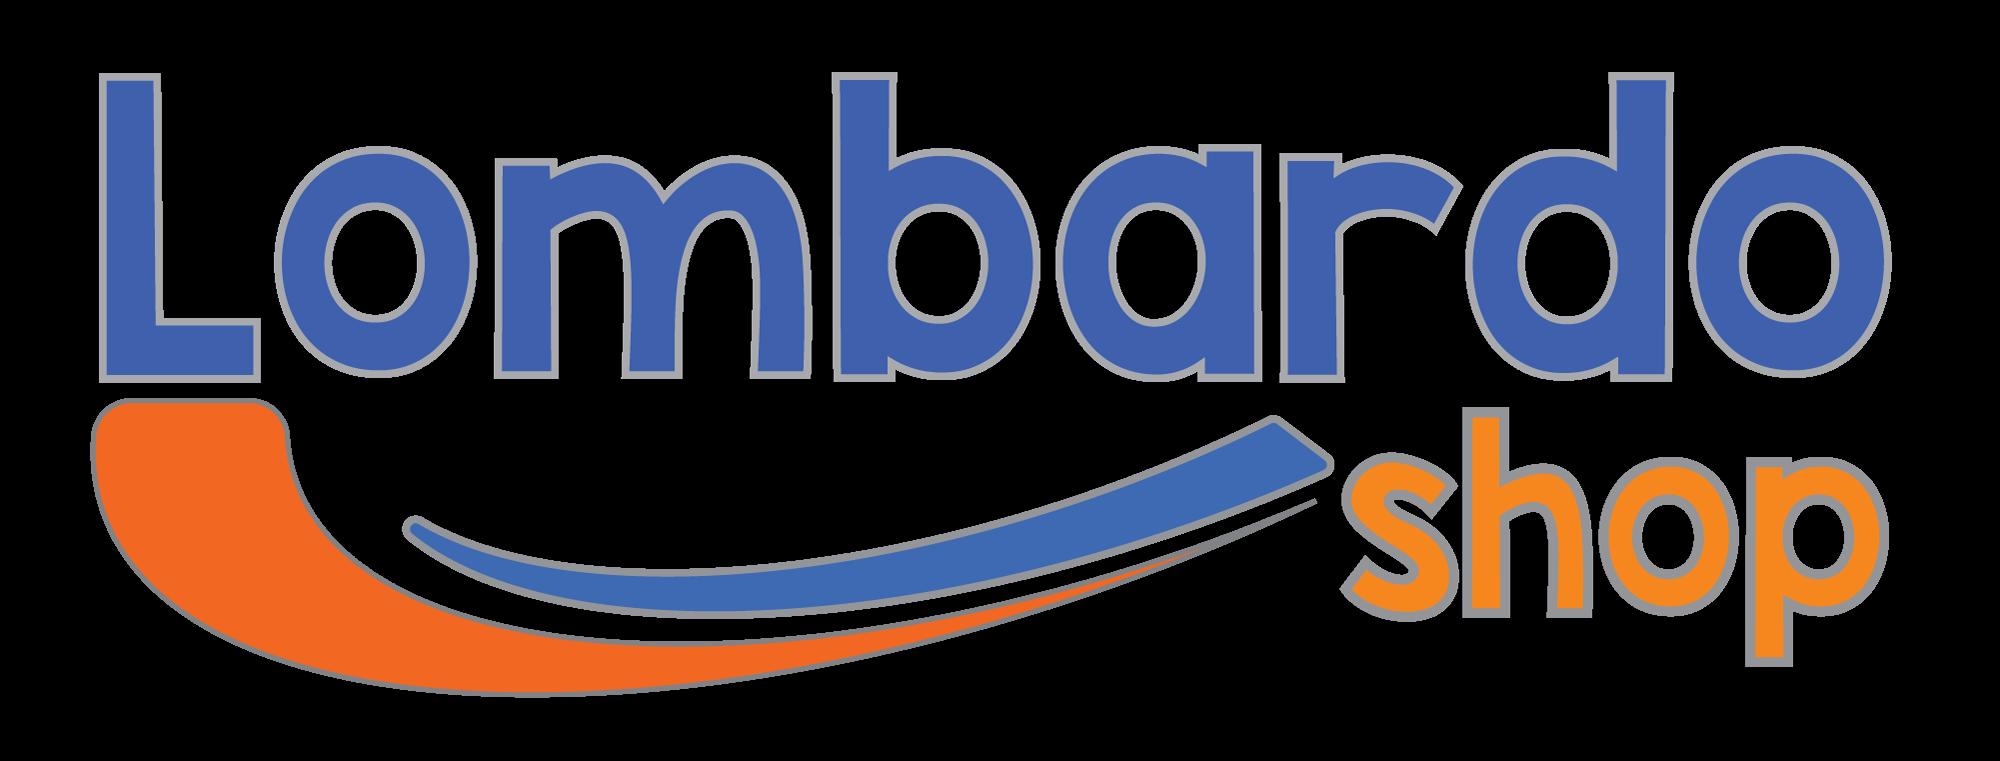 Blog Lombardo Shop